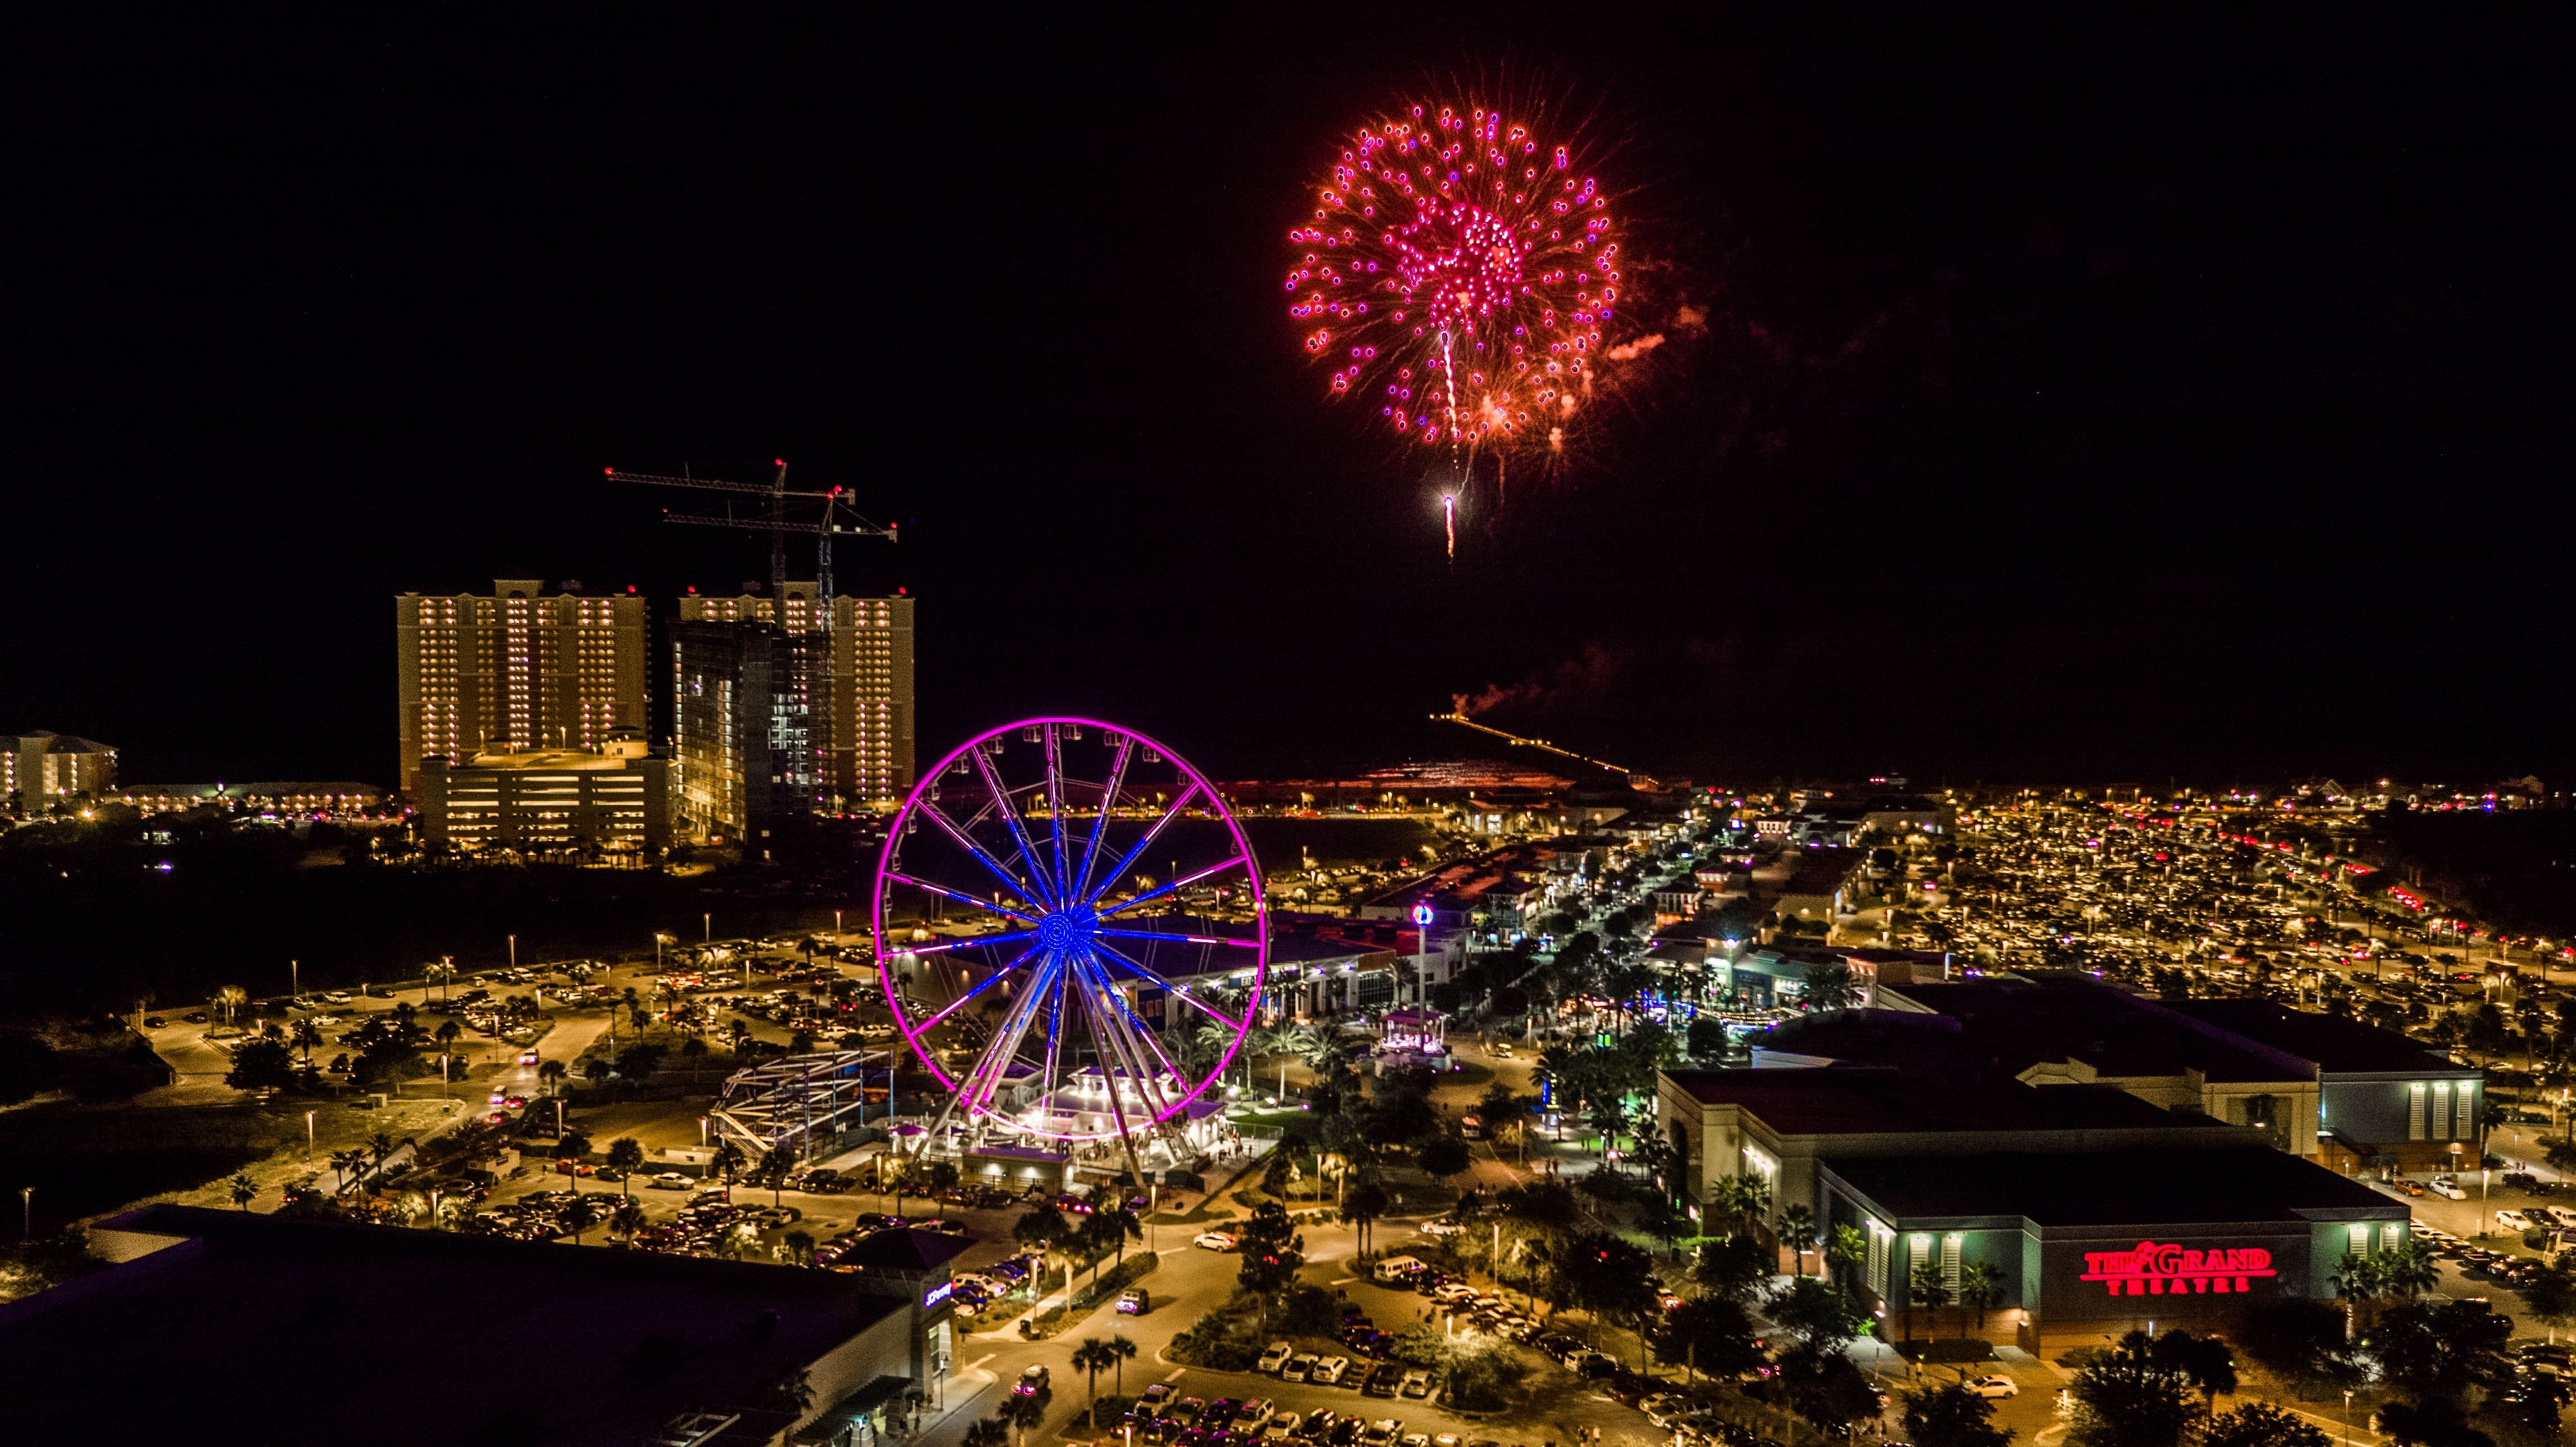 Panama City Beach Christmas Events 2021 Panama City Beach Says Goodbye To 2020 With Fireworks